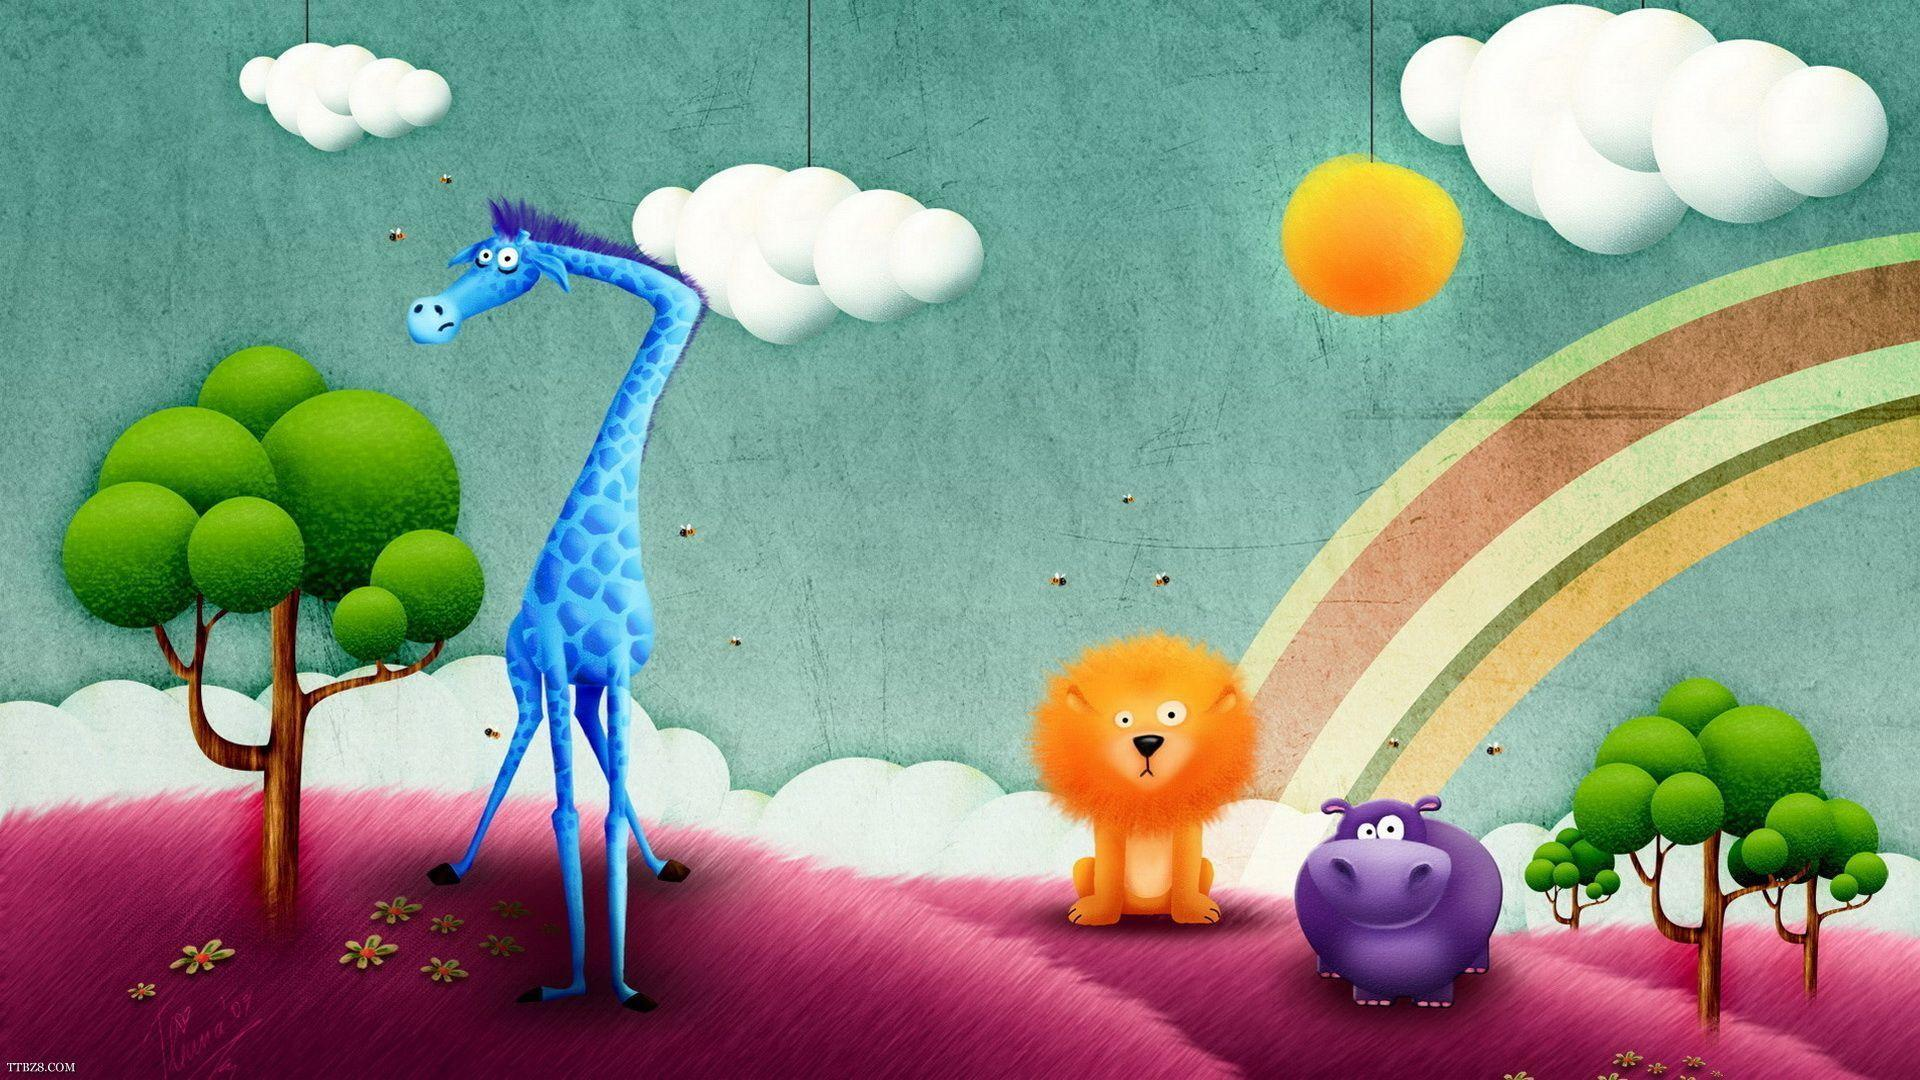 Wallpaper Desktop Love cartoon : cute cartoon Wallpapers - Wallpaper cave